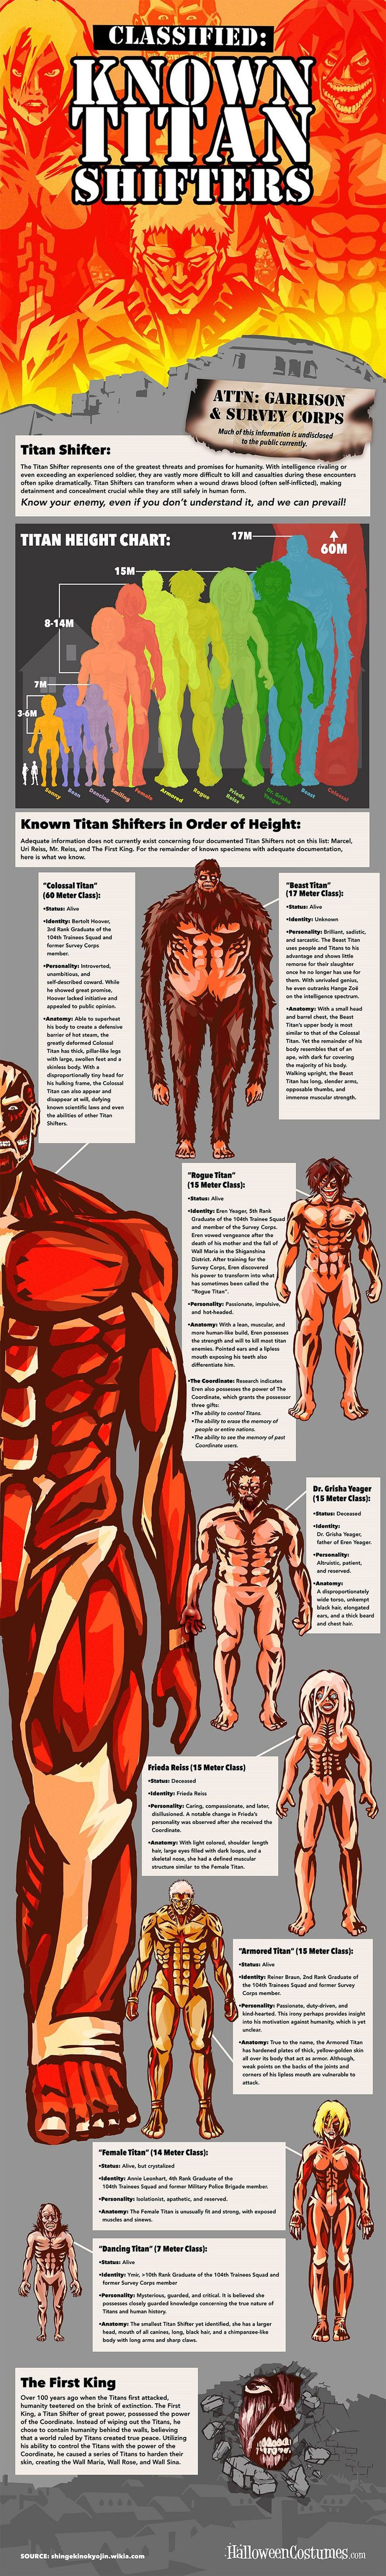 Attack on Titan: know Titan Shifters